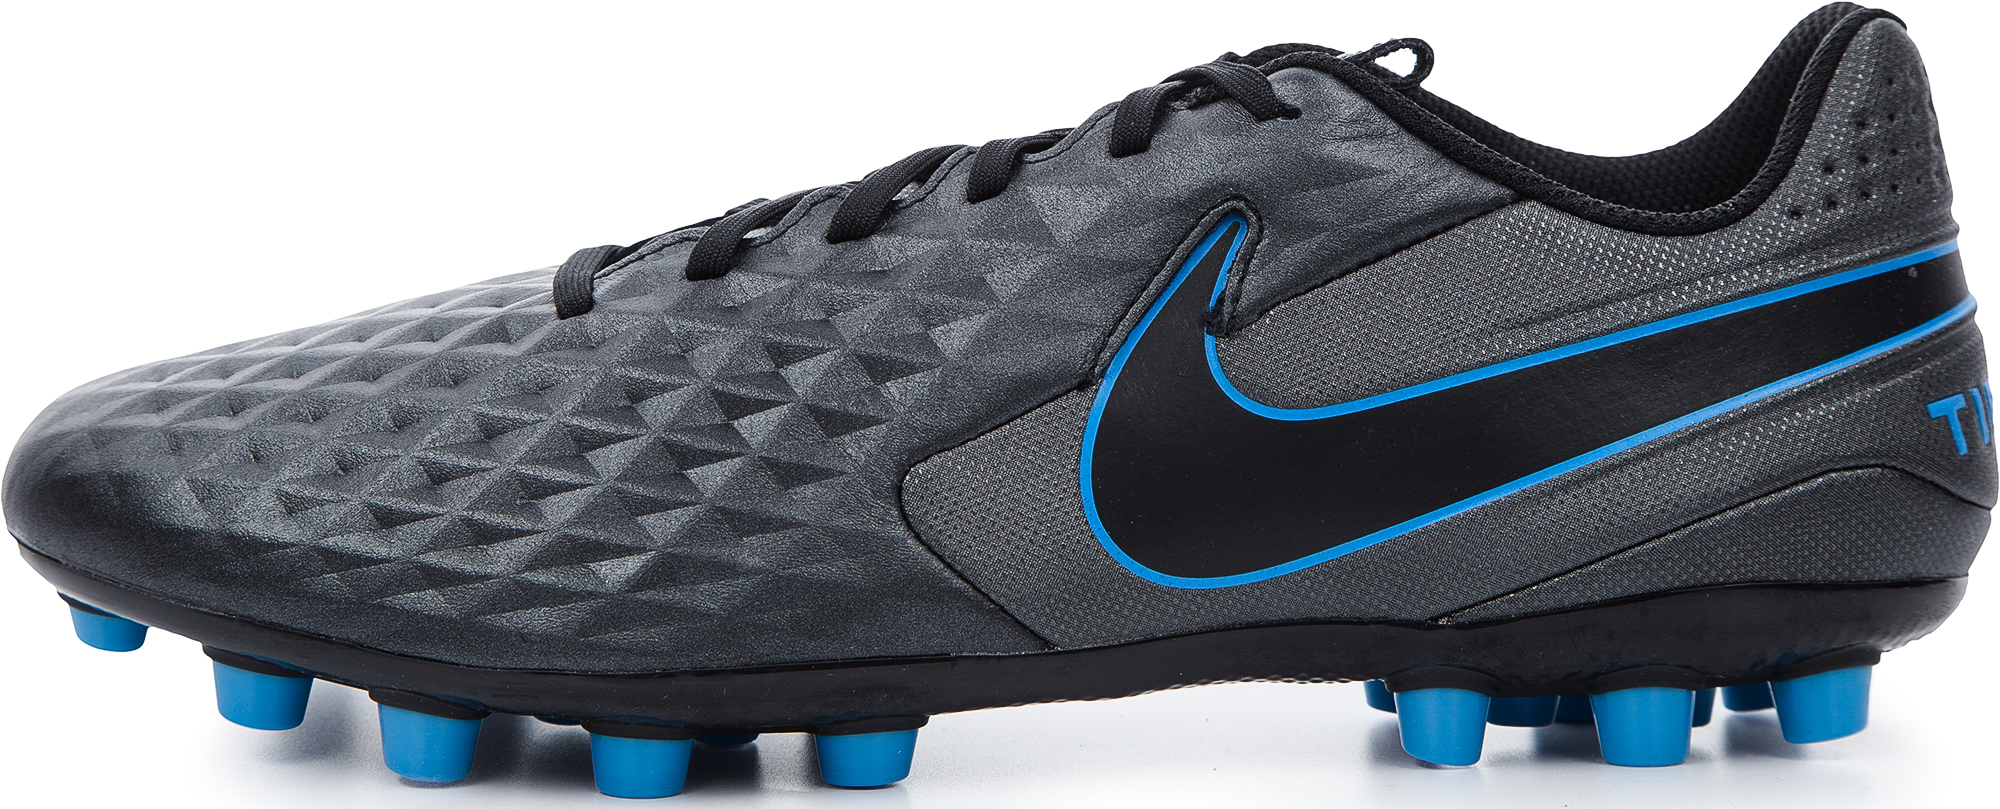 Nike Бутсы мужские Nike Tiempo Legend 8 Academy AG, размер 45 все цены